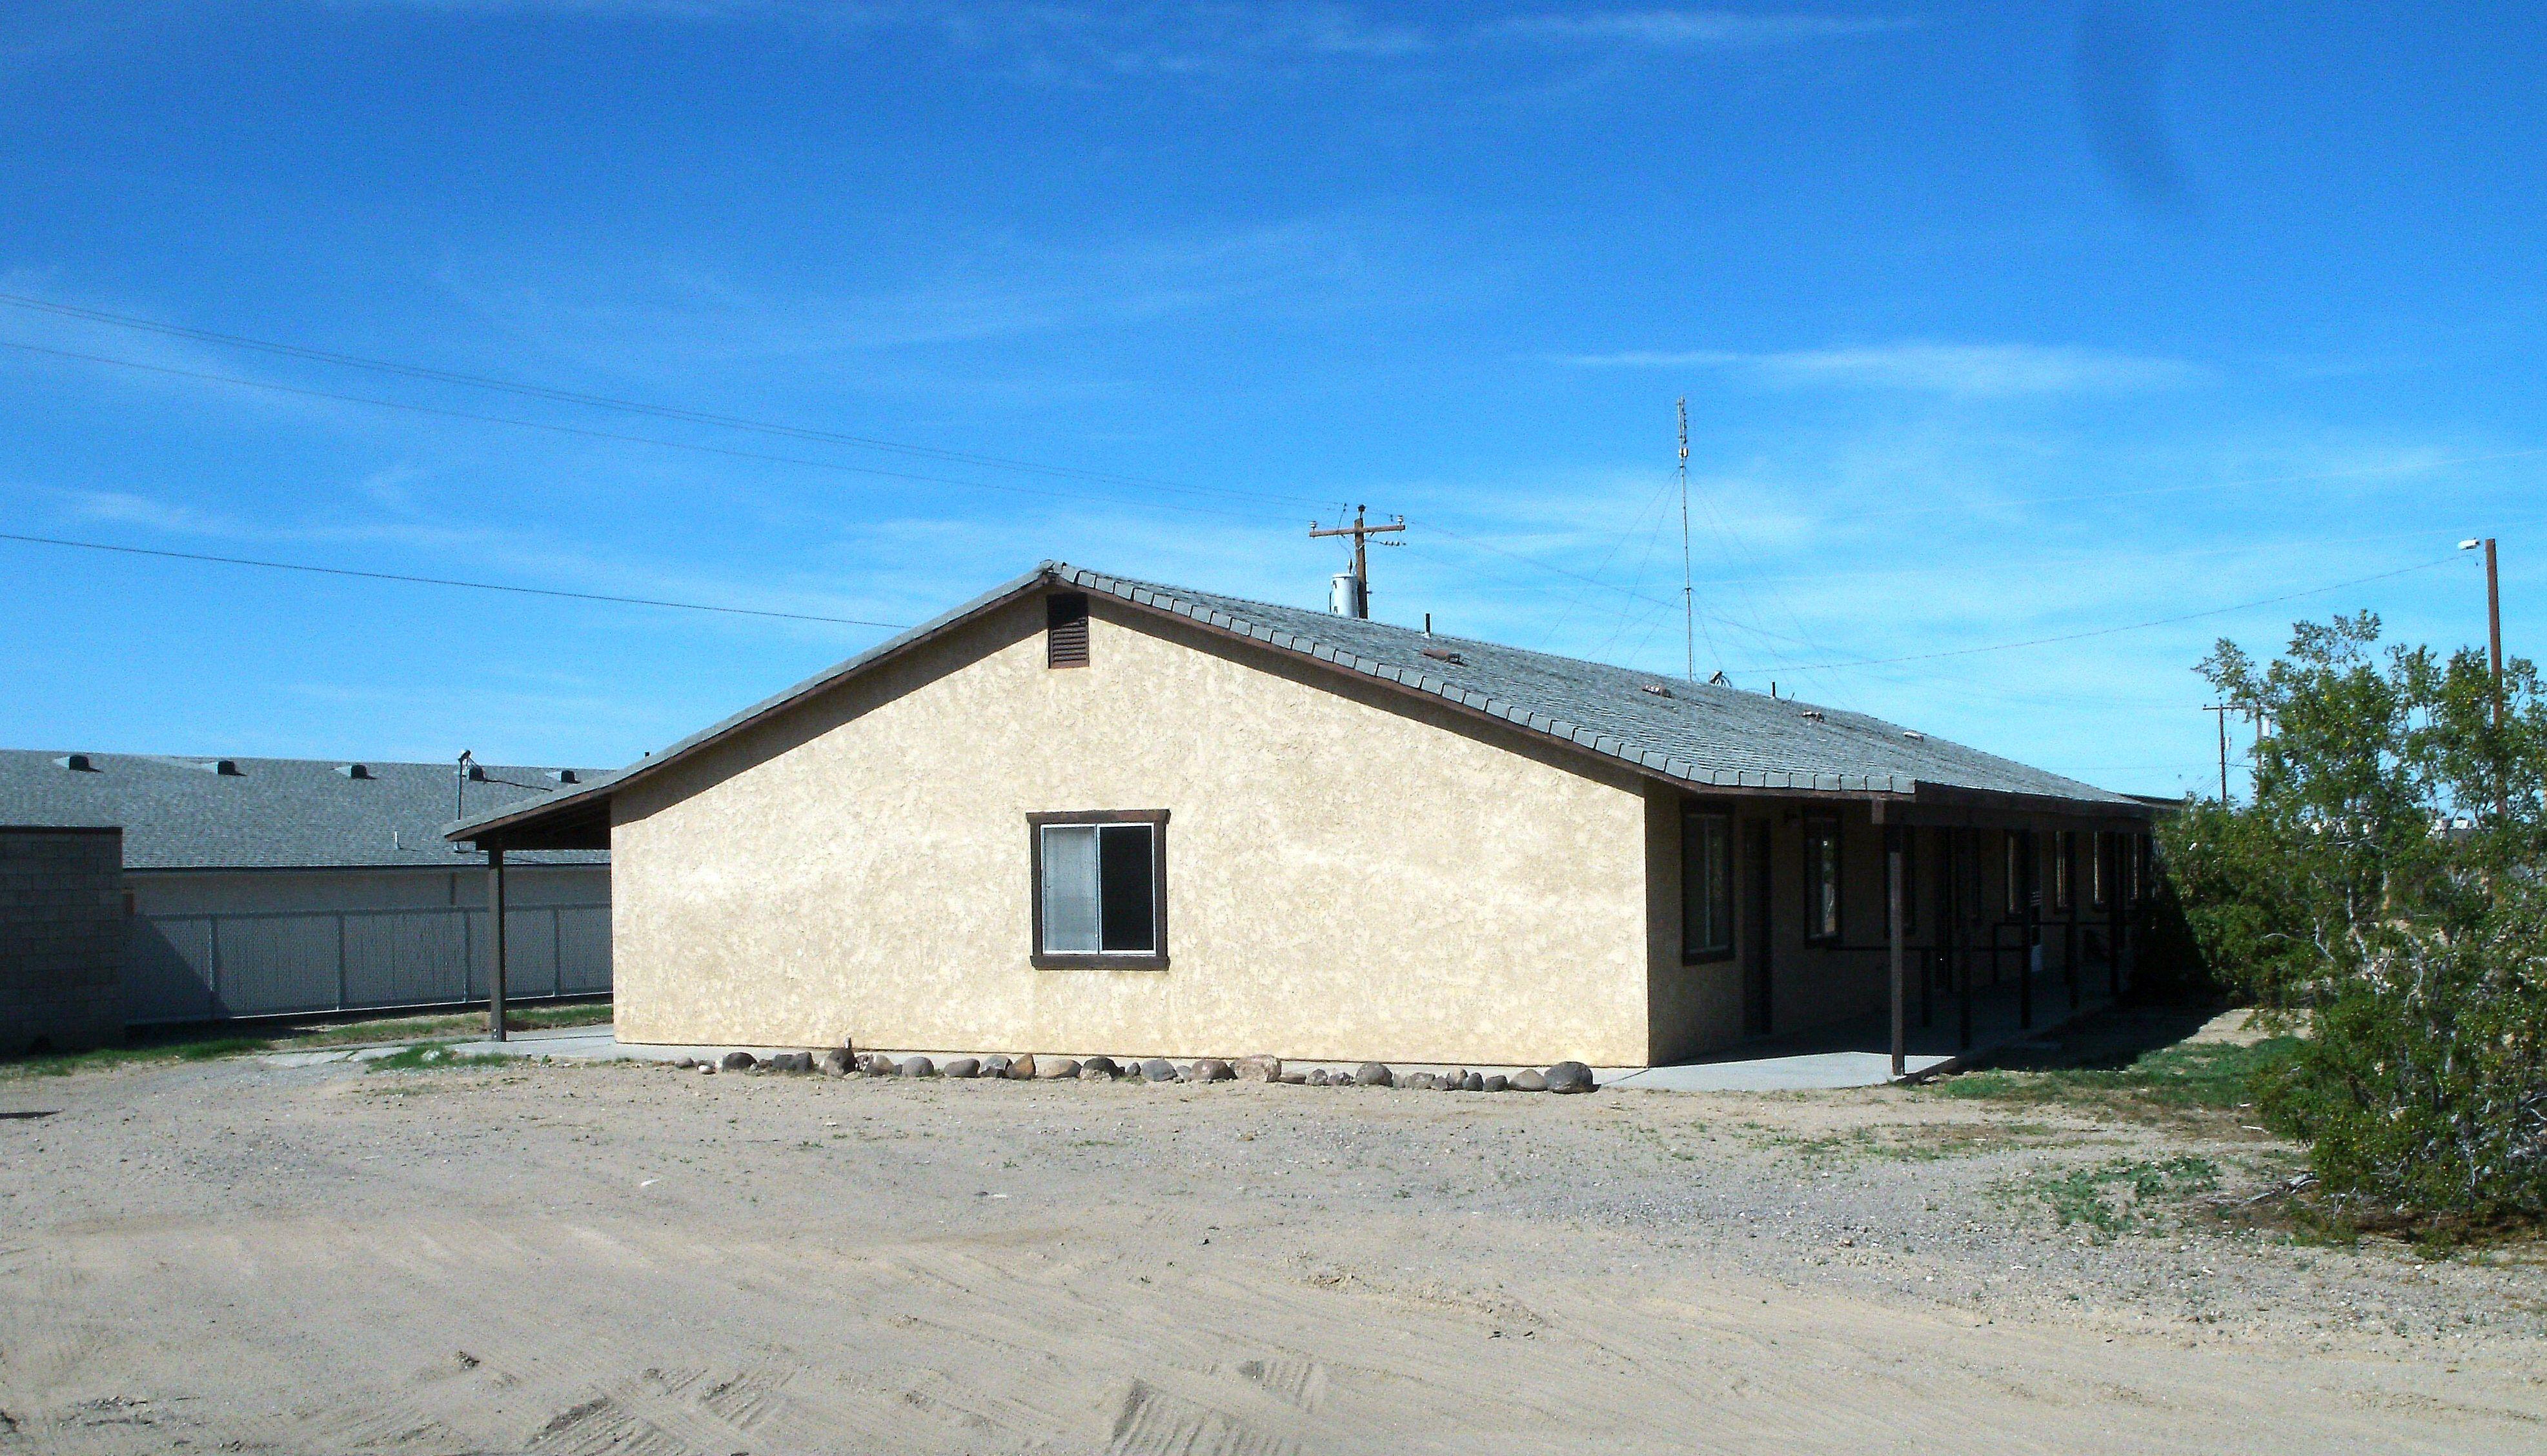 Arizona mohave county topock - Arizona Mohave County Topock 36